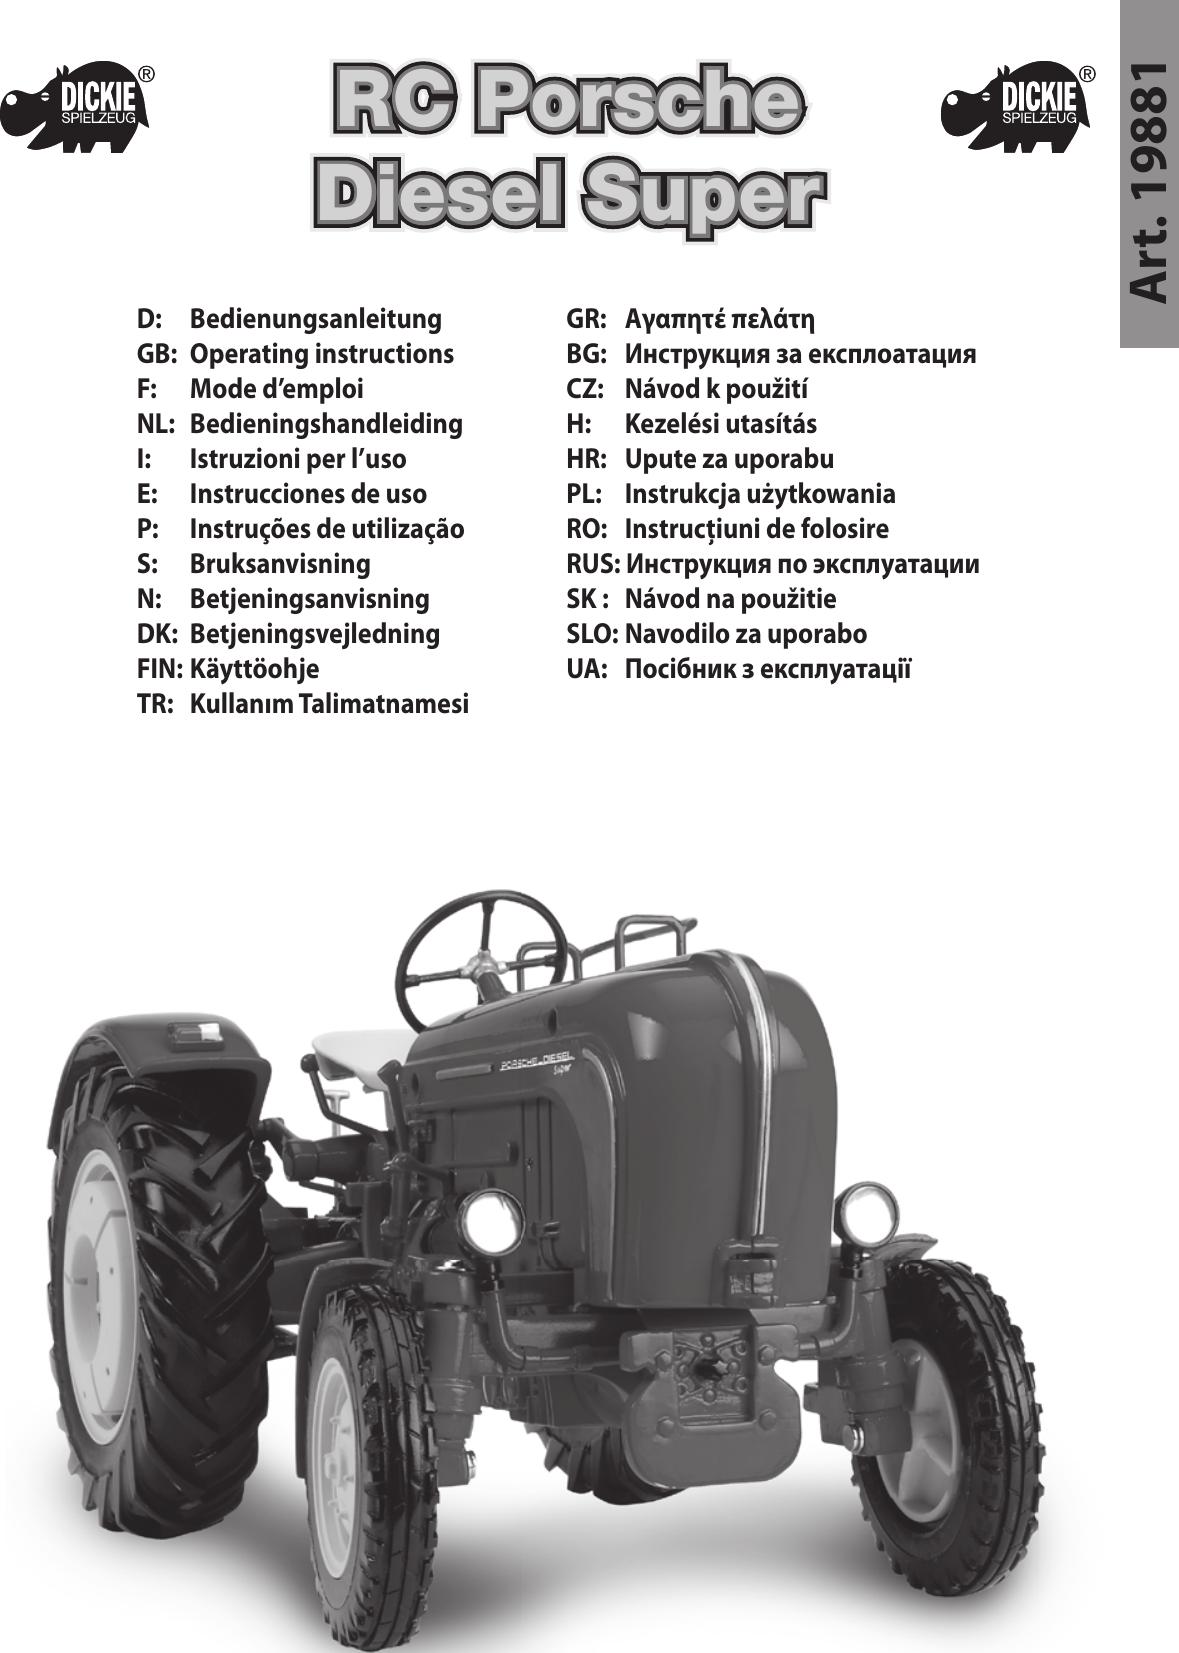 Classic auto values user manuals array classic car values kelley blue book user manuals fandeluxe Gallery